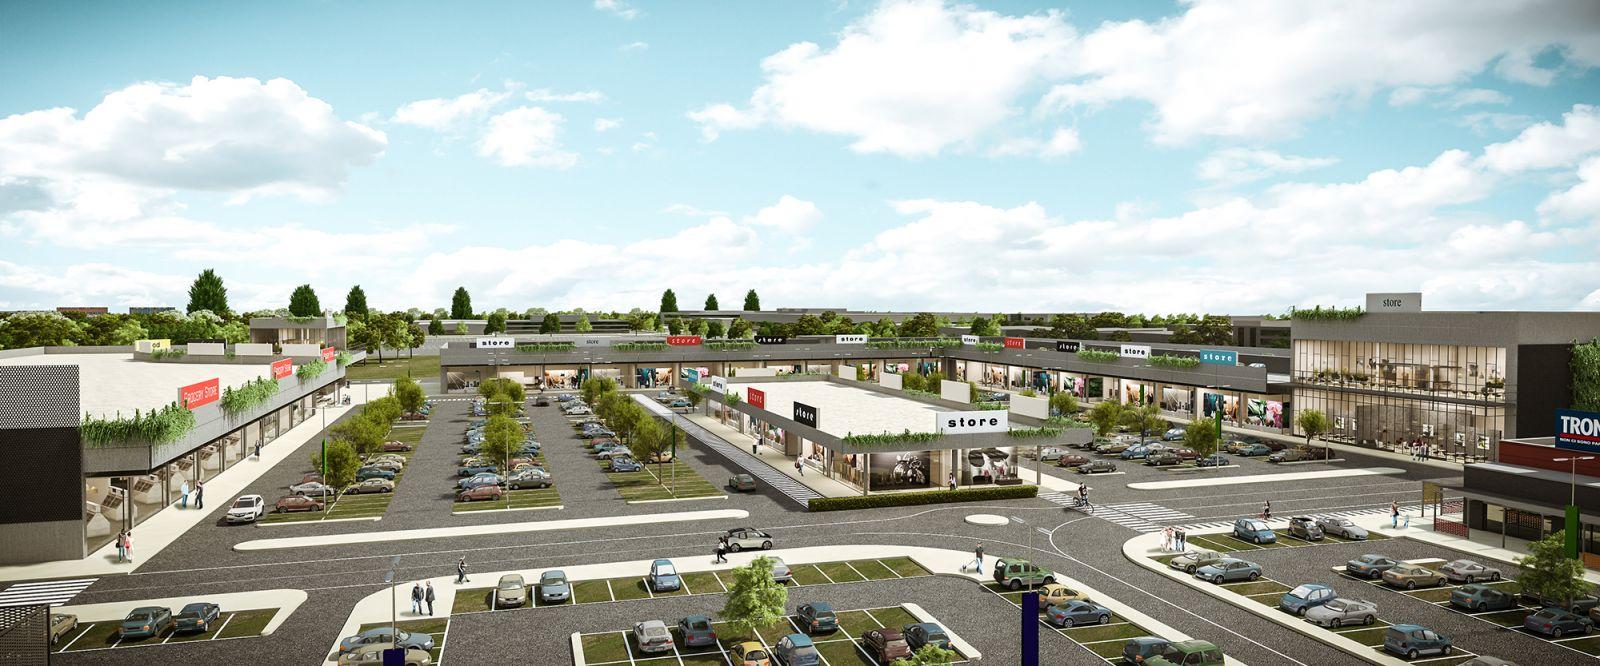 Settimo Cielo Retail Park 394